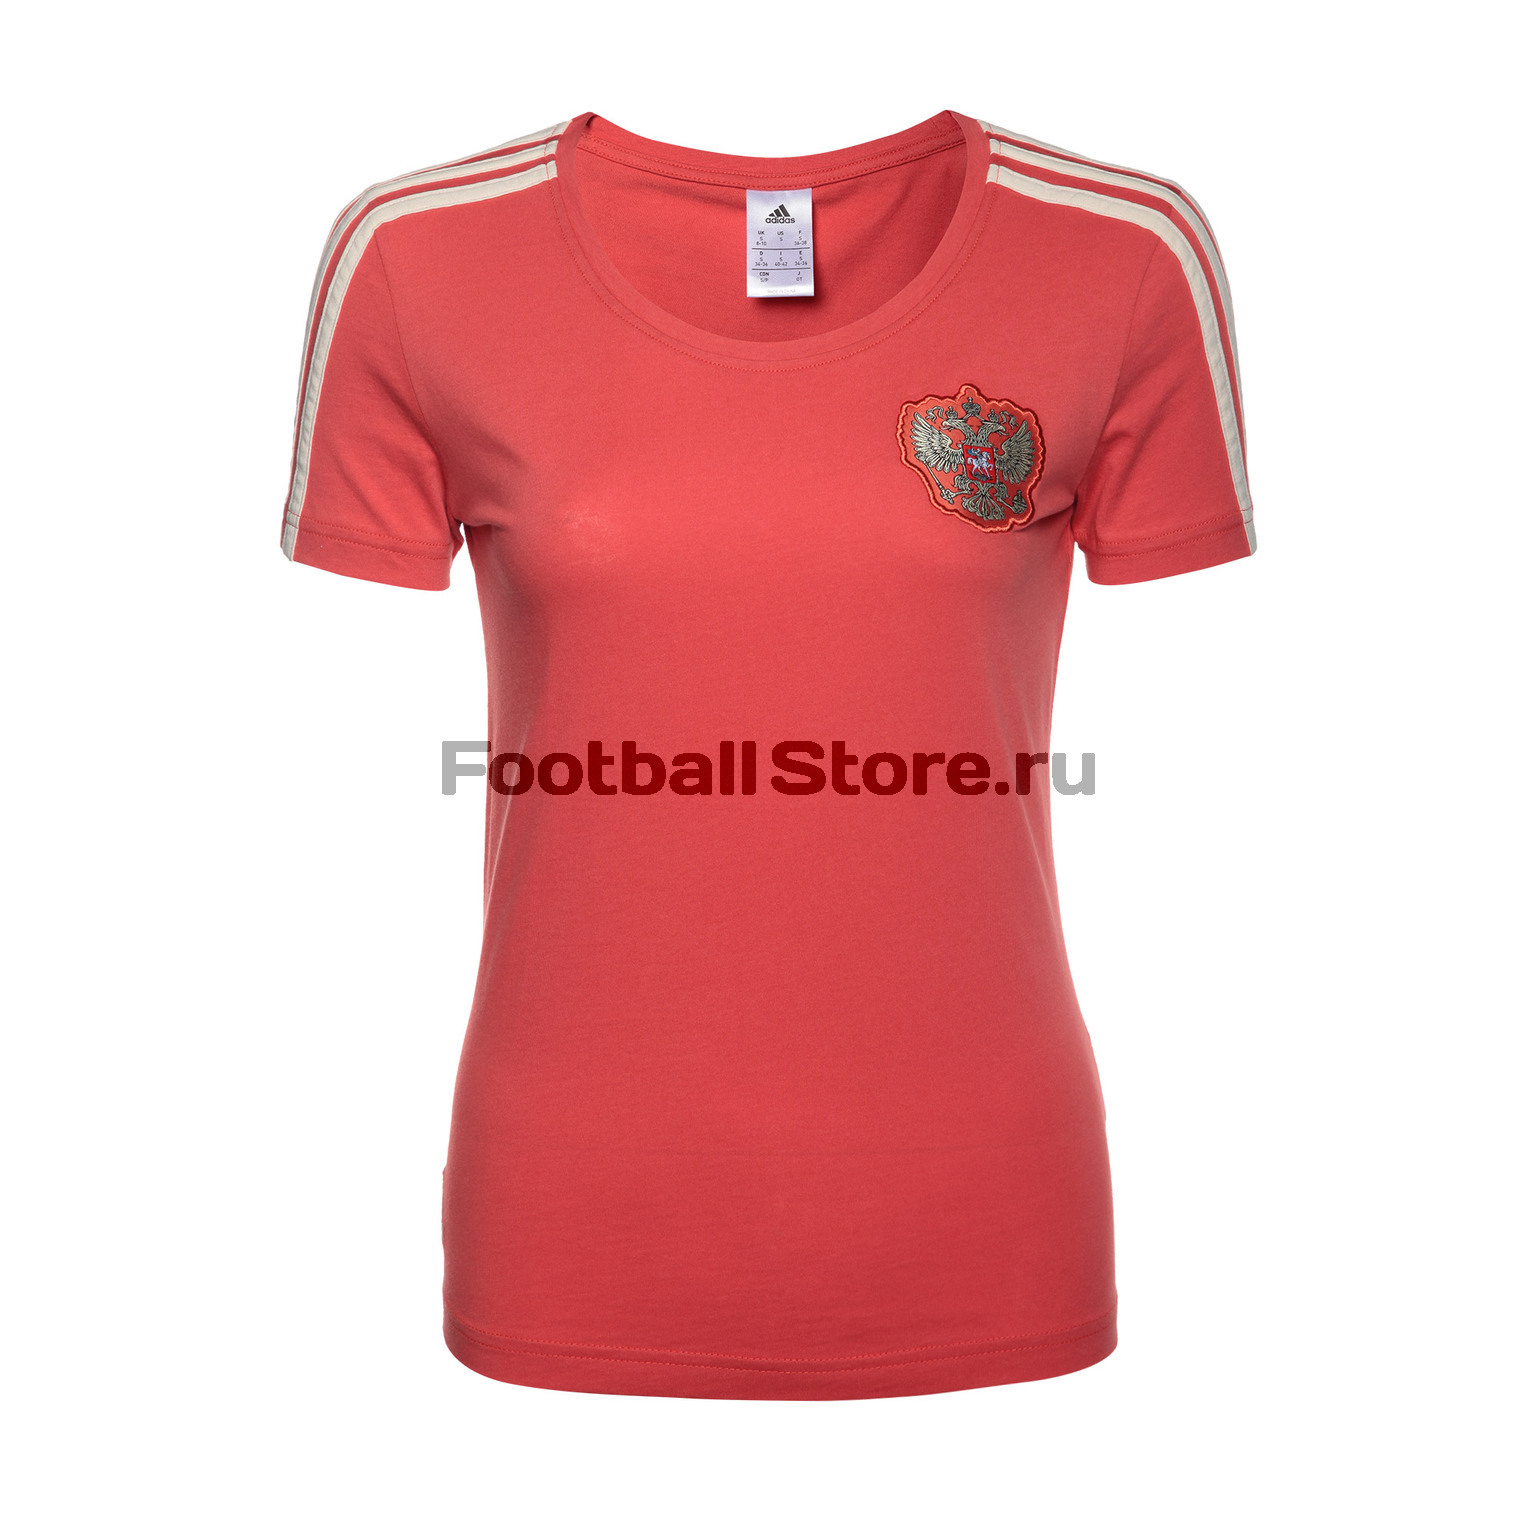 Футболка женская Adidas Russia Tee CD5284 levi's® белая футболка с эмблемой the perfect tee